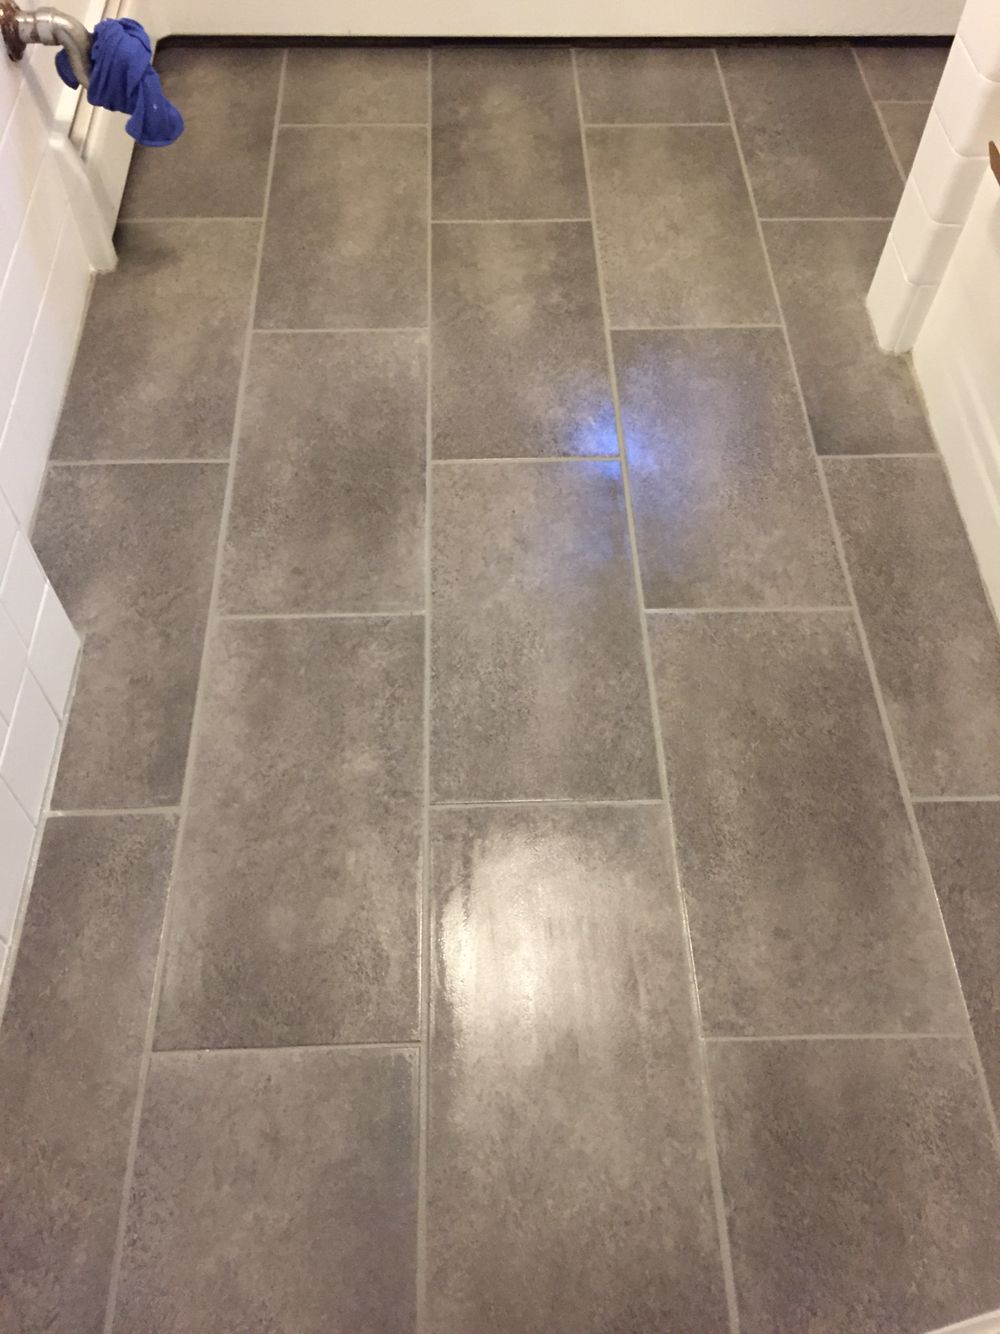 Home Depot Trafficmaster Groutable Vinyl Tile Coastal Grey